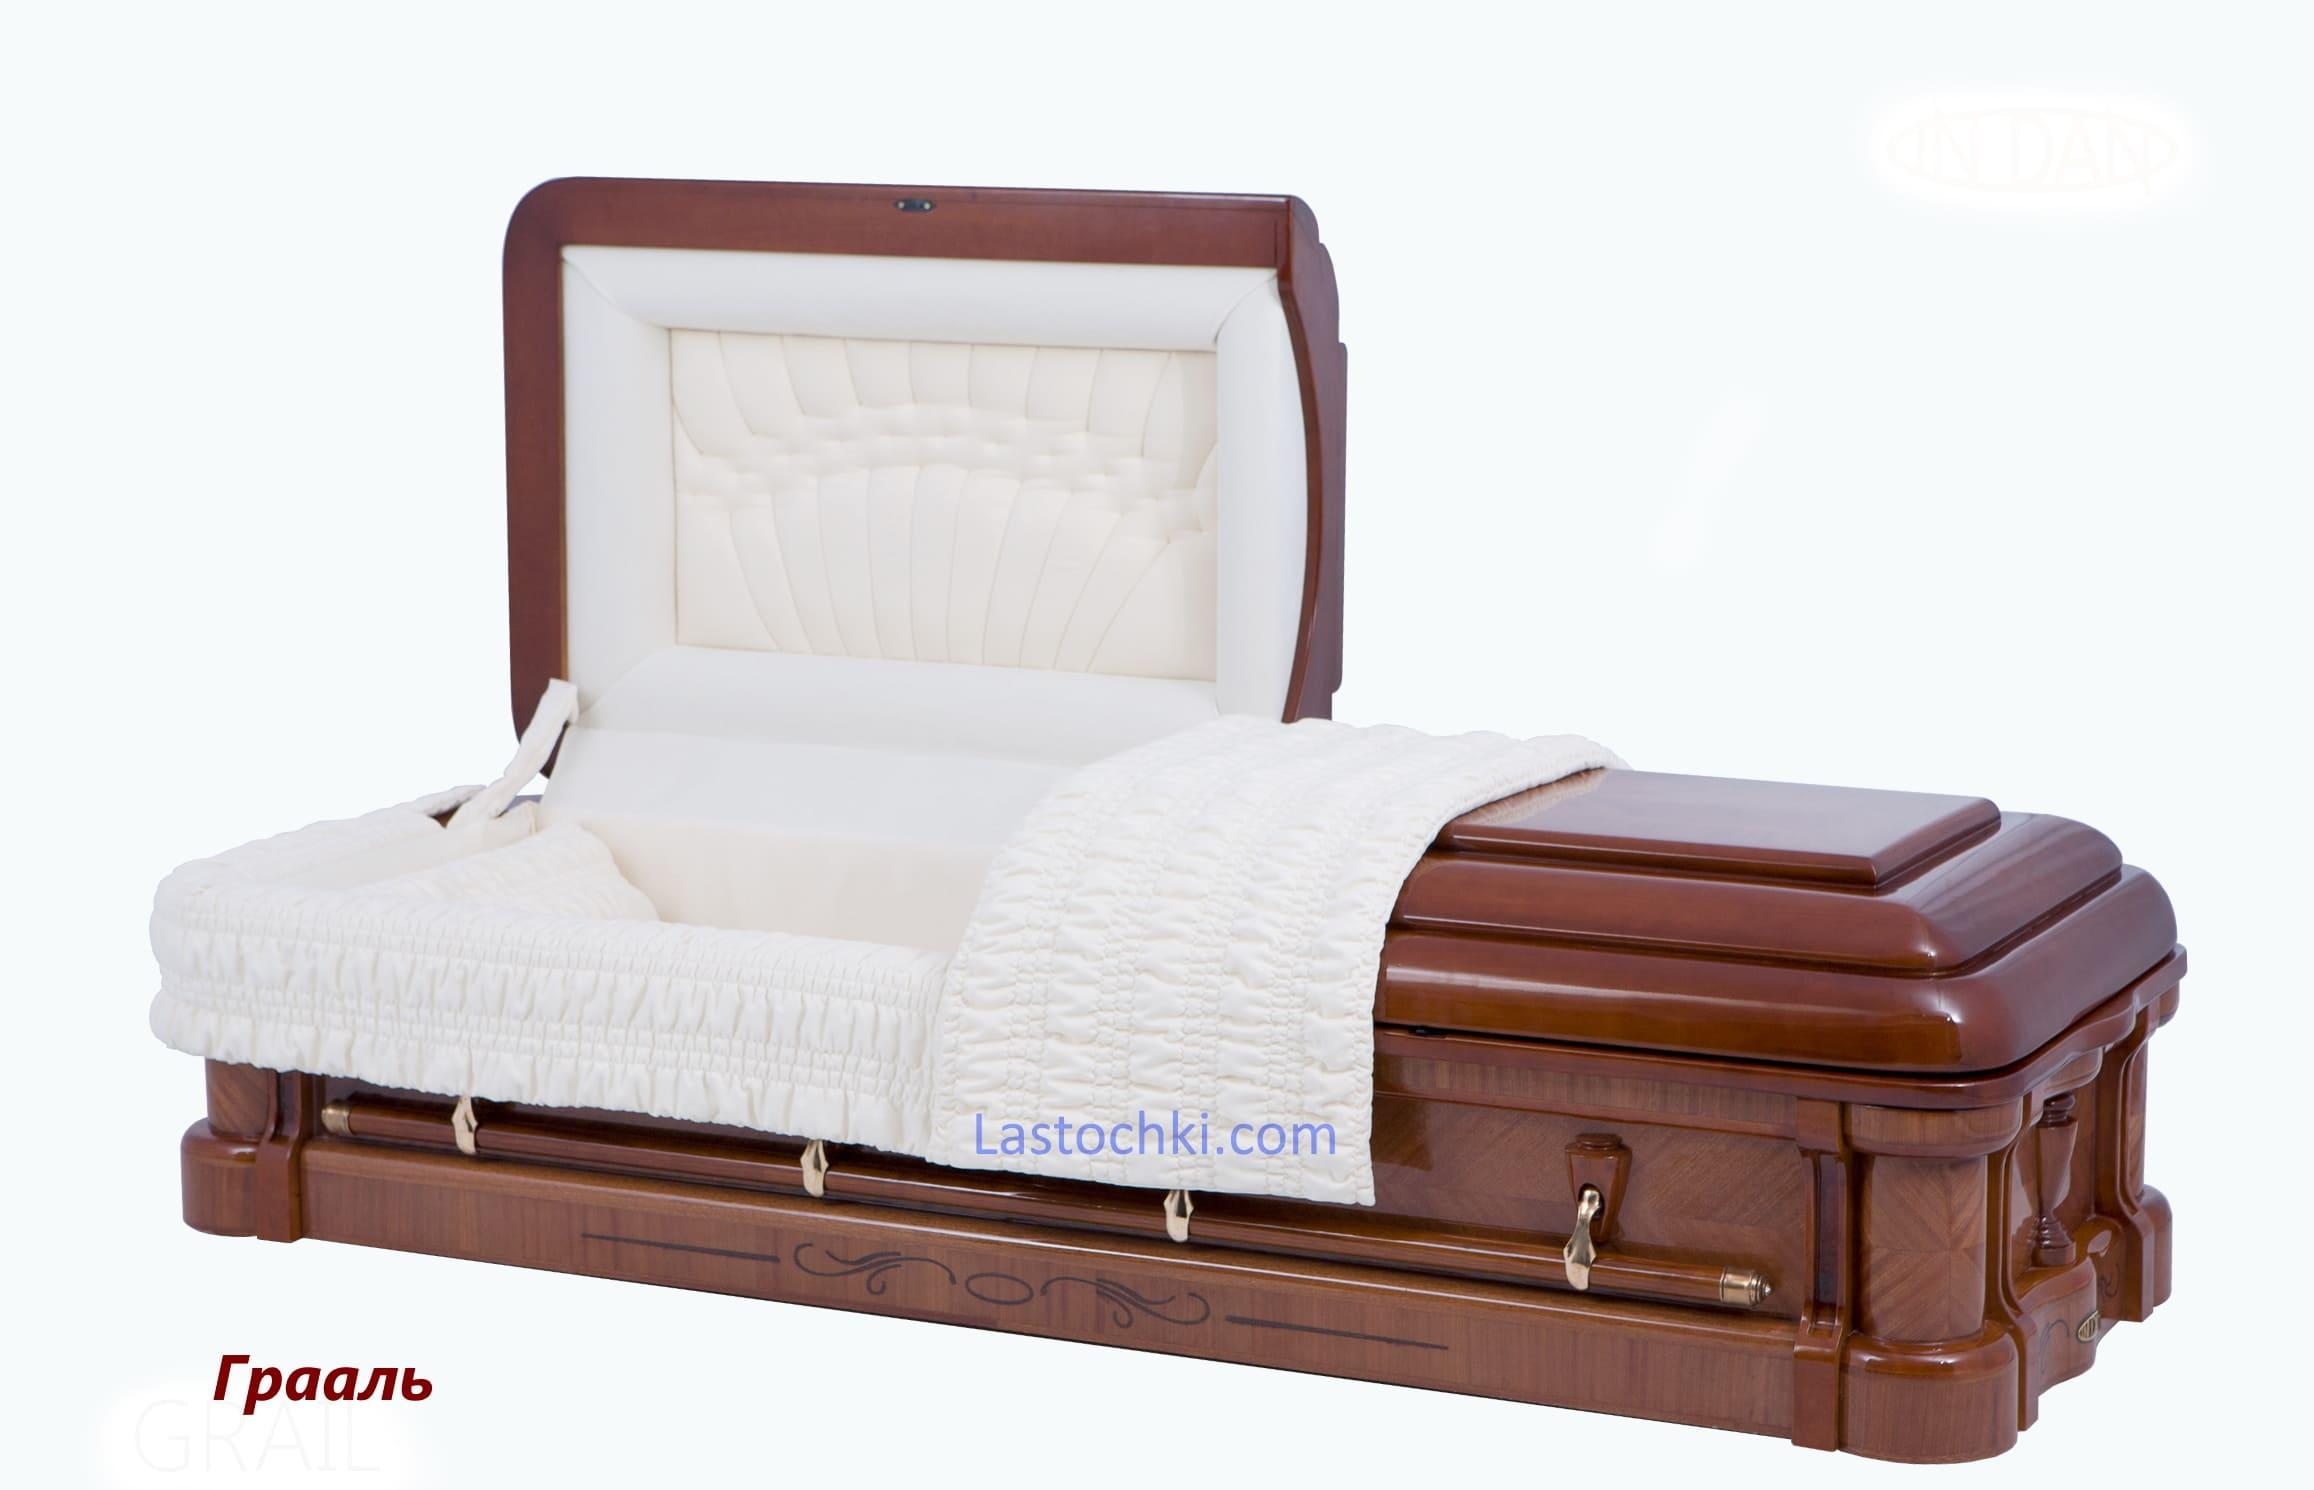 Саркофаг Грааль инкрустированый  -  Цена 300 000 грн.